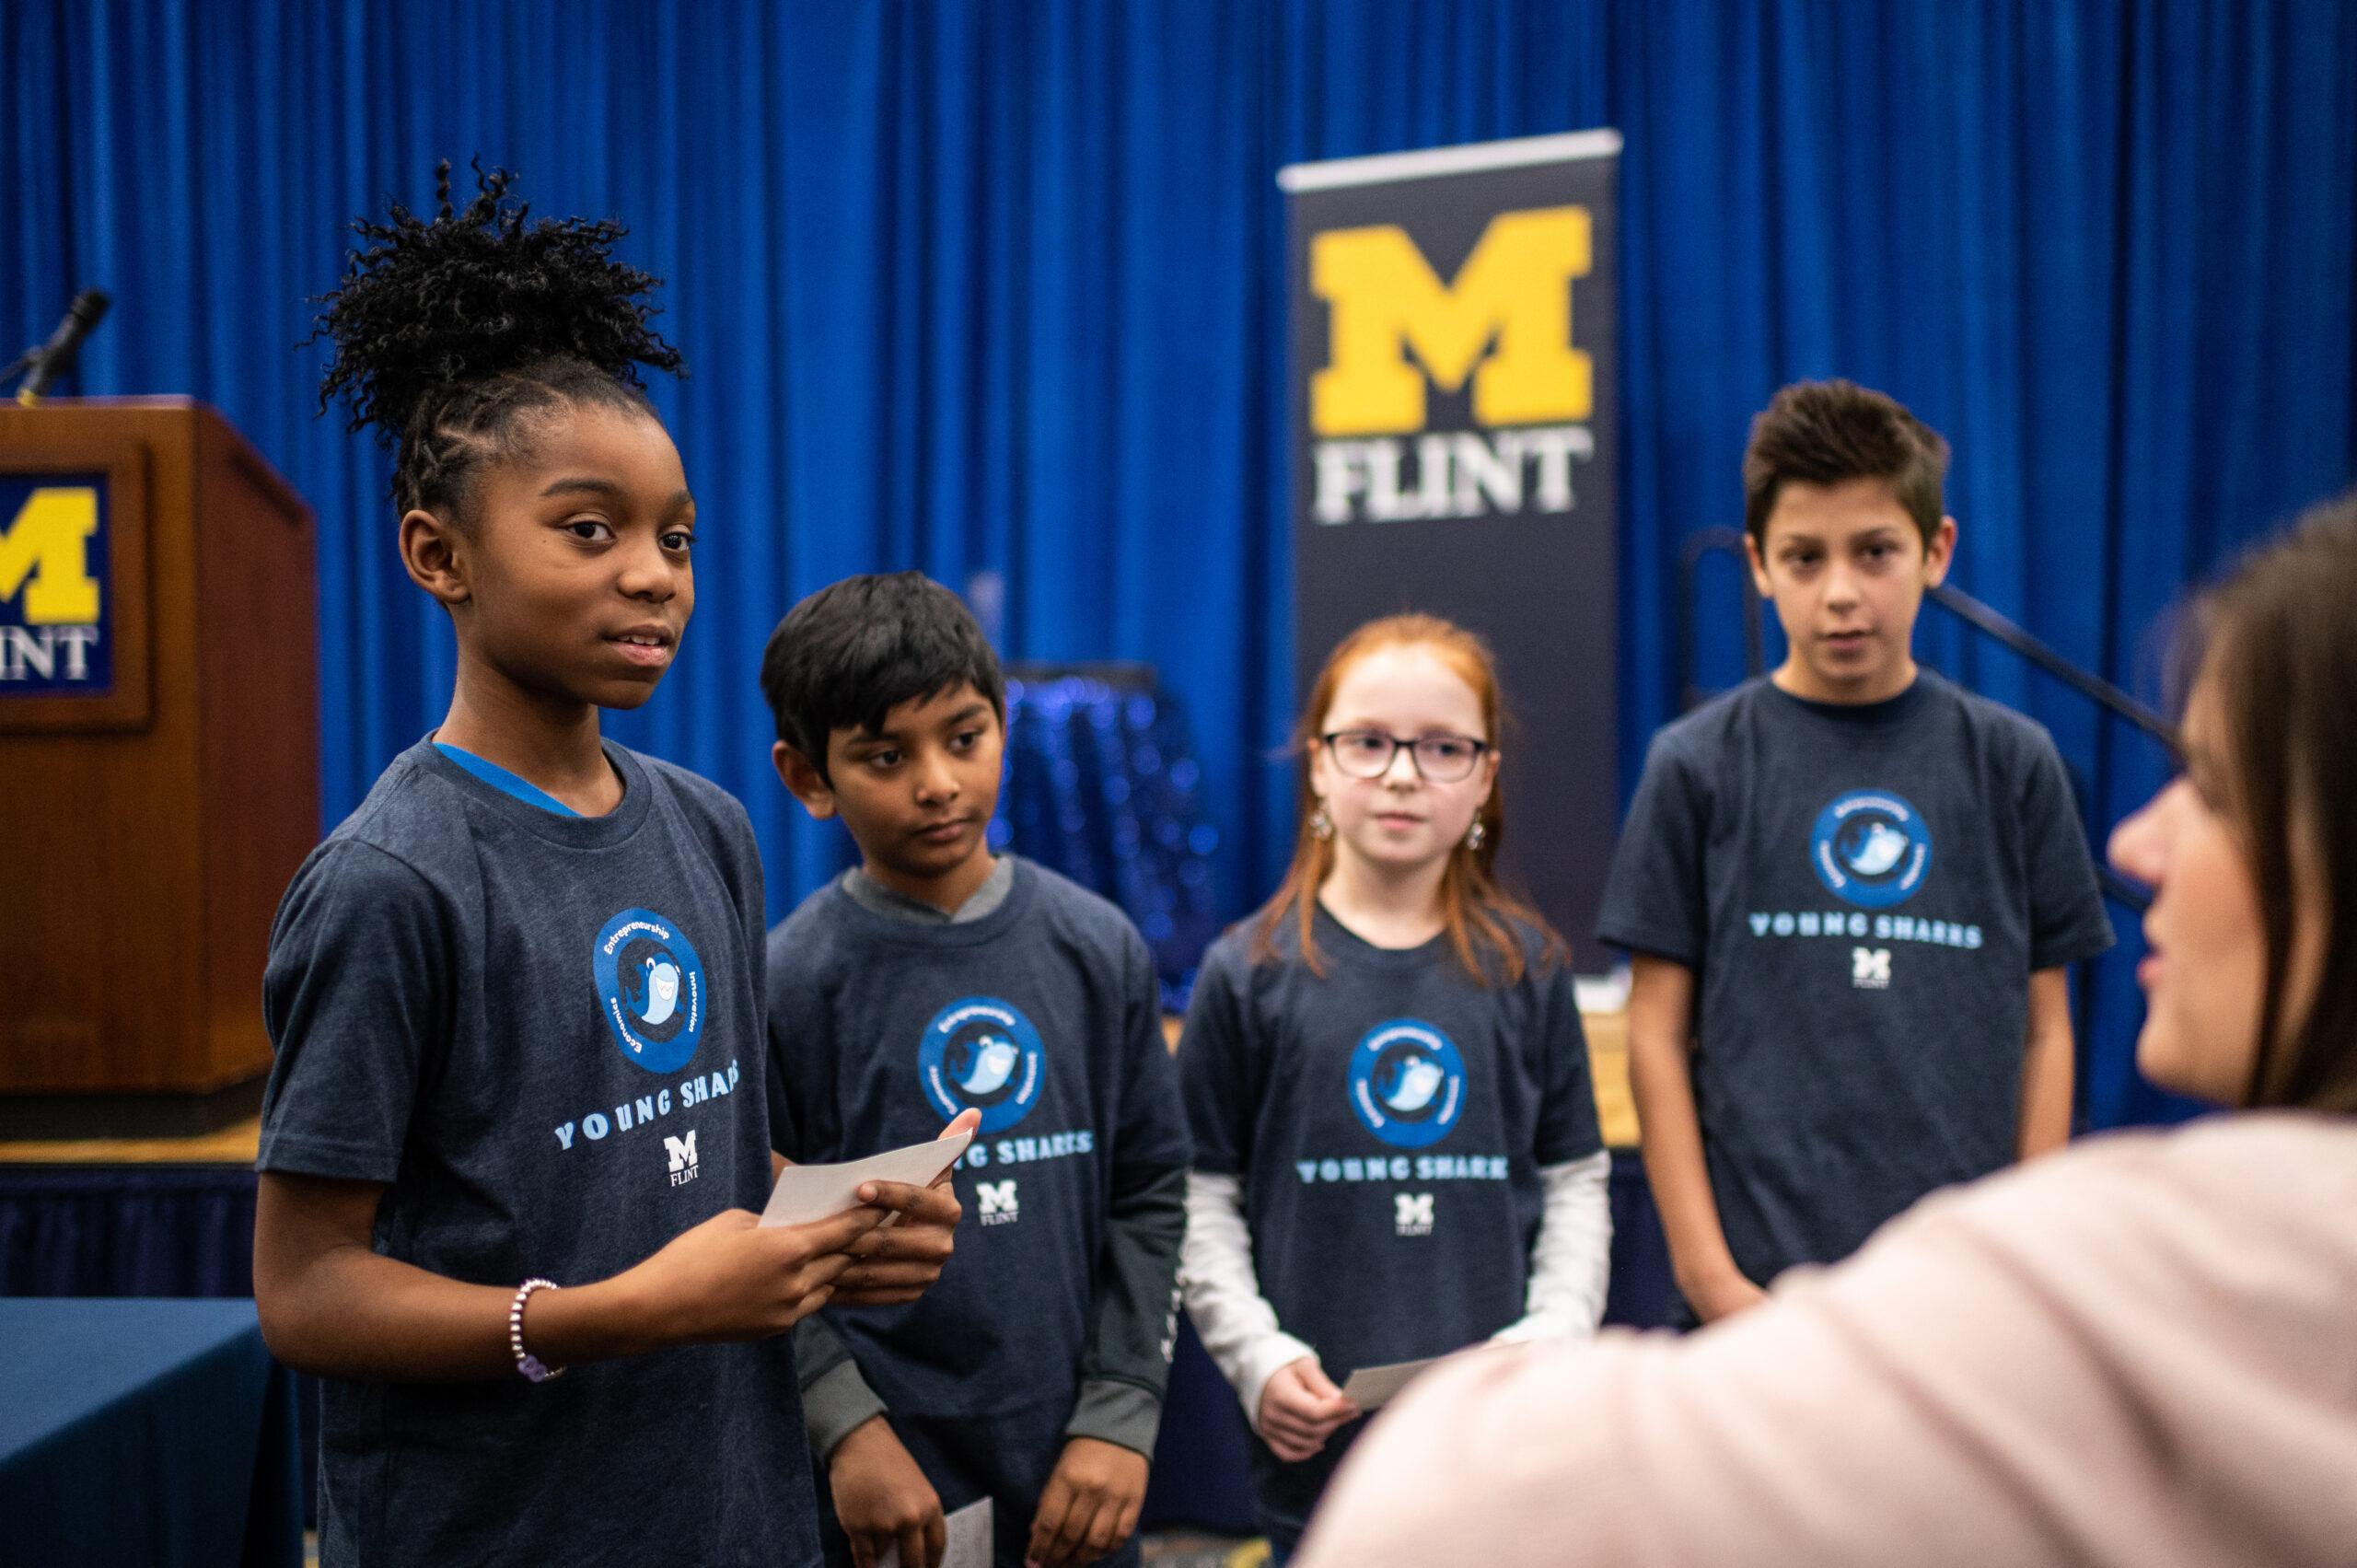 Students from Mason Elementary School of Grand Blanc Community Schools discuss their presentation strategy.